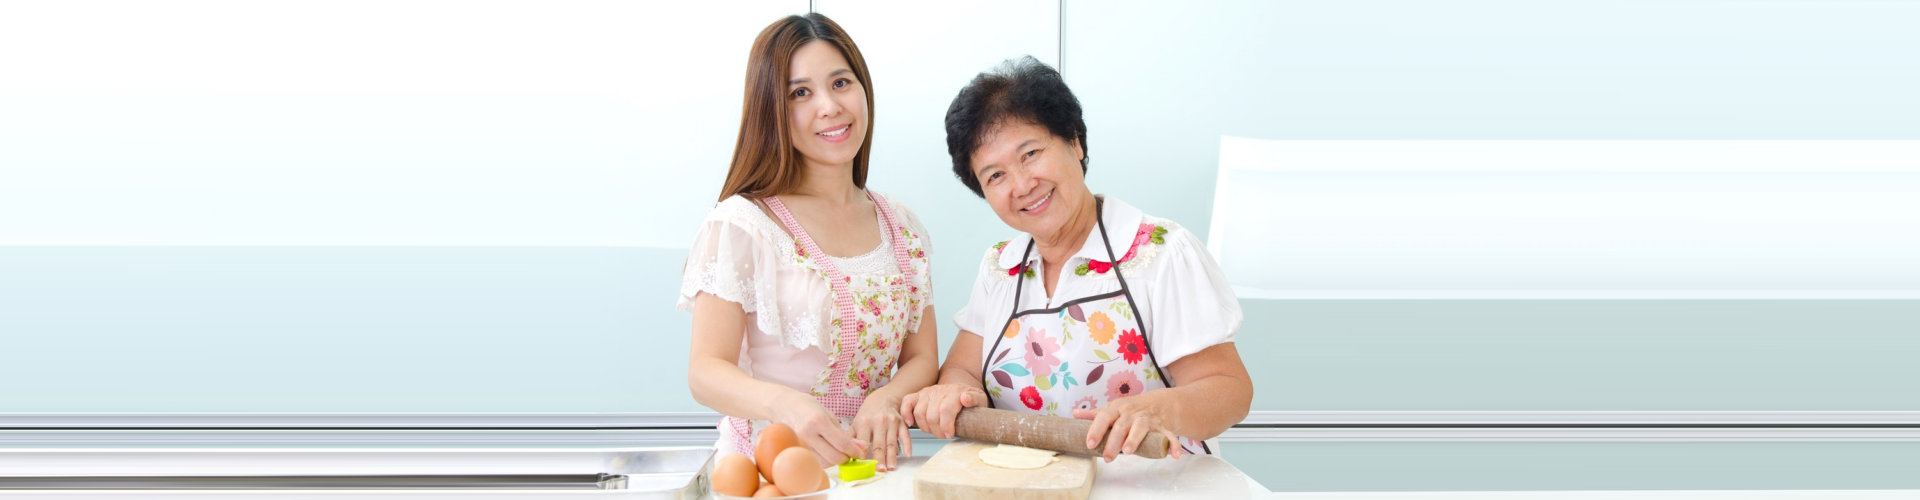 elder woman with caregiver preparing foods